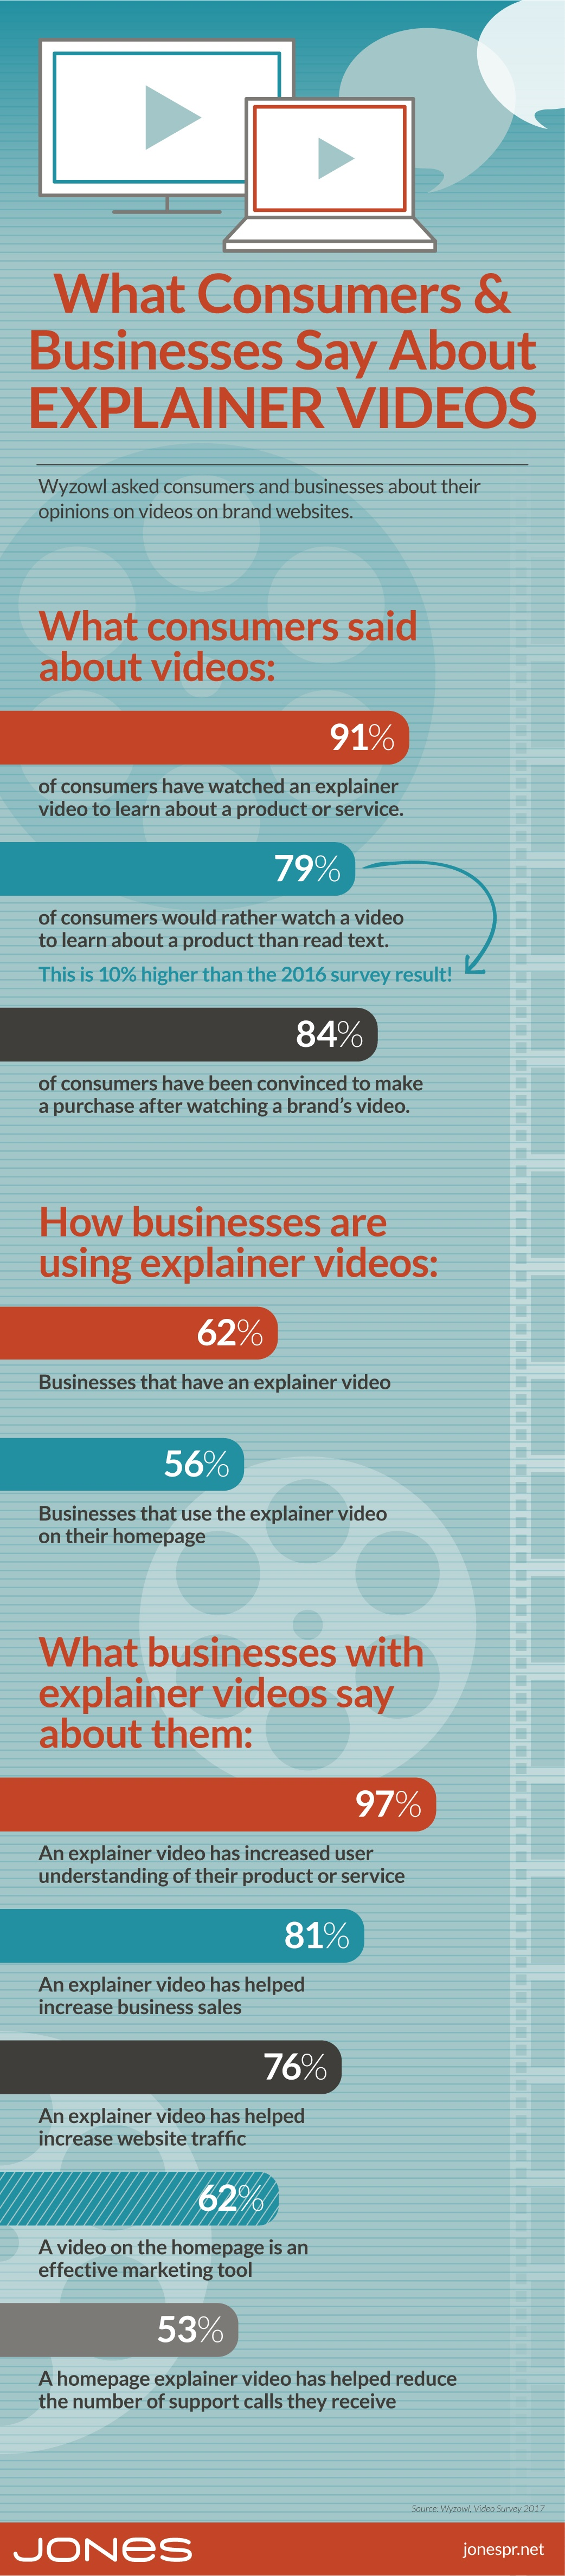 video marketing infographic explainer video